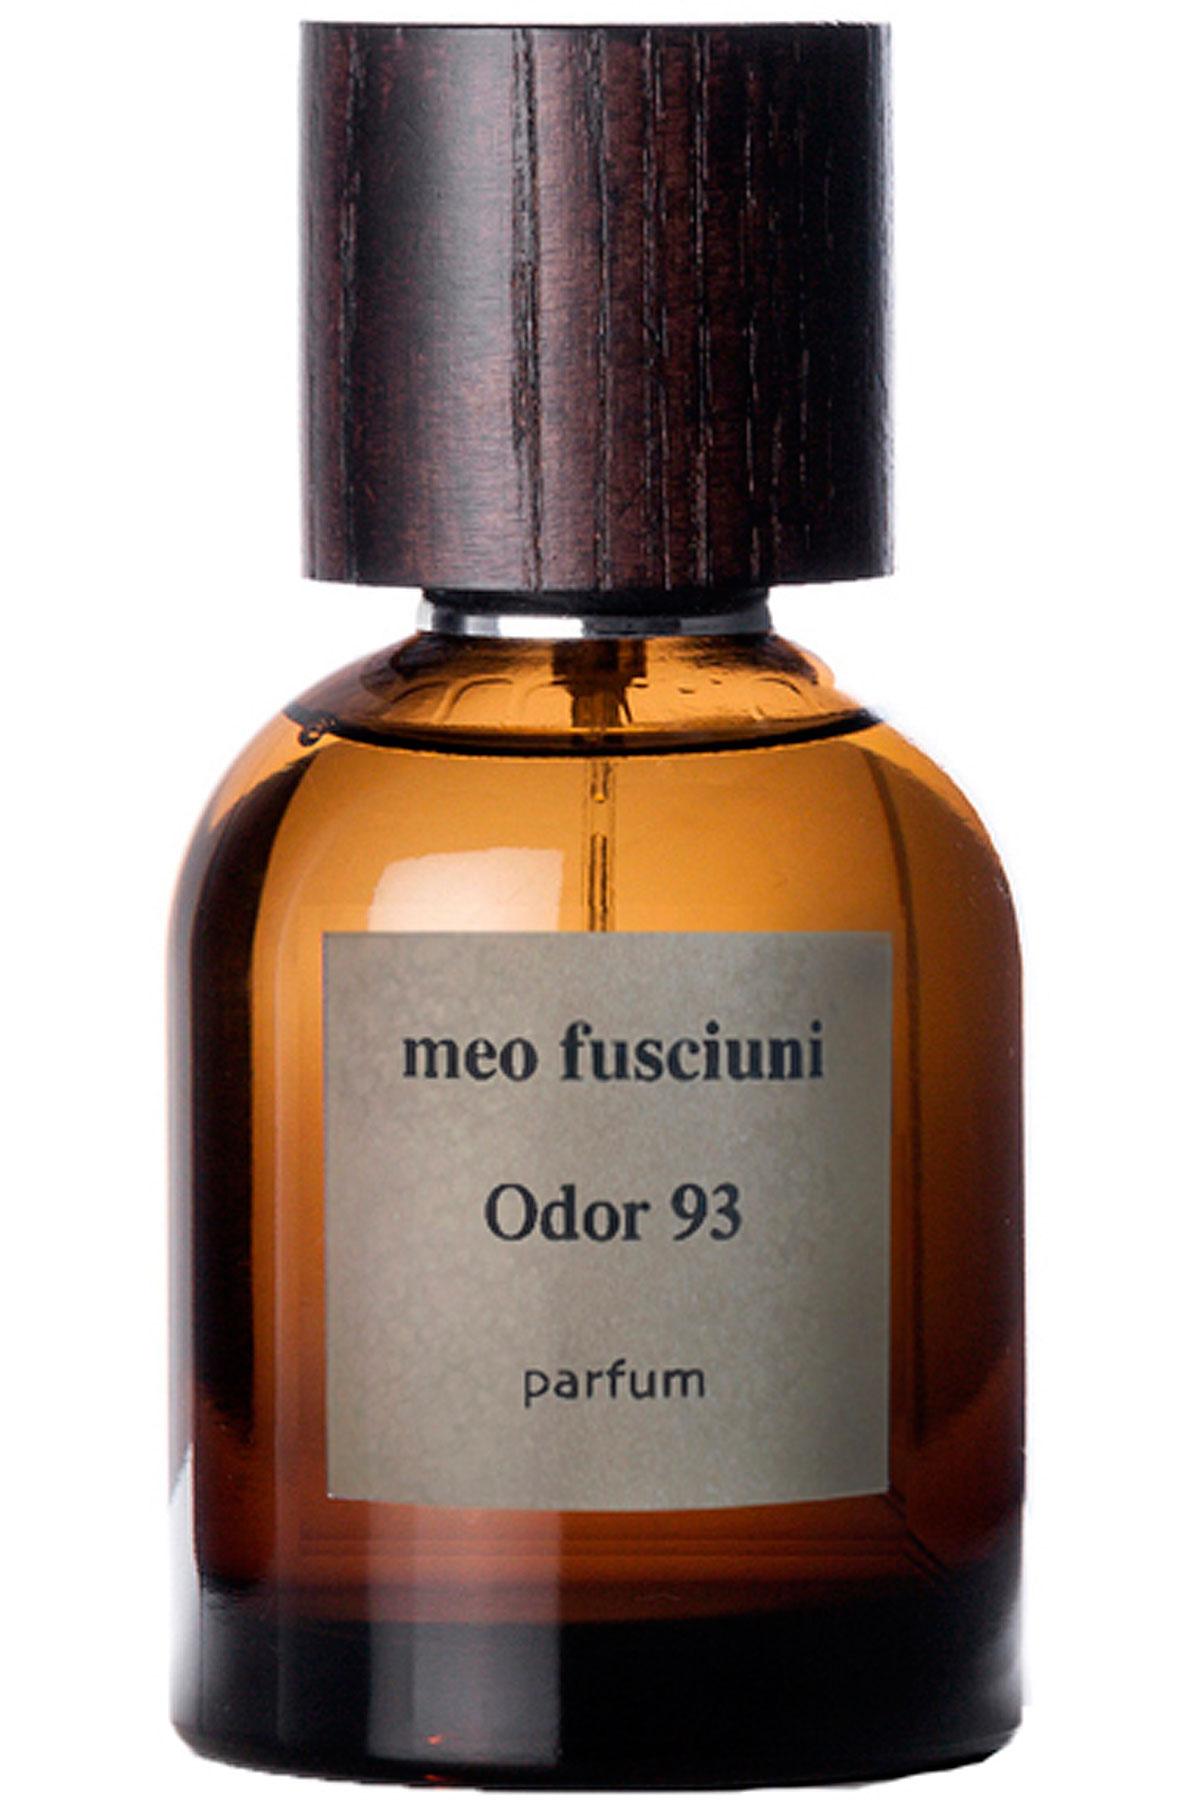 Meo Fusciuni Fragrances for Women, Odor 93 - Eau De Parfum - 100 Ml, 2019, 100 ml